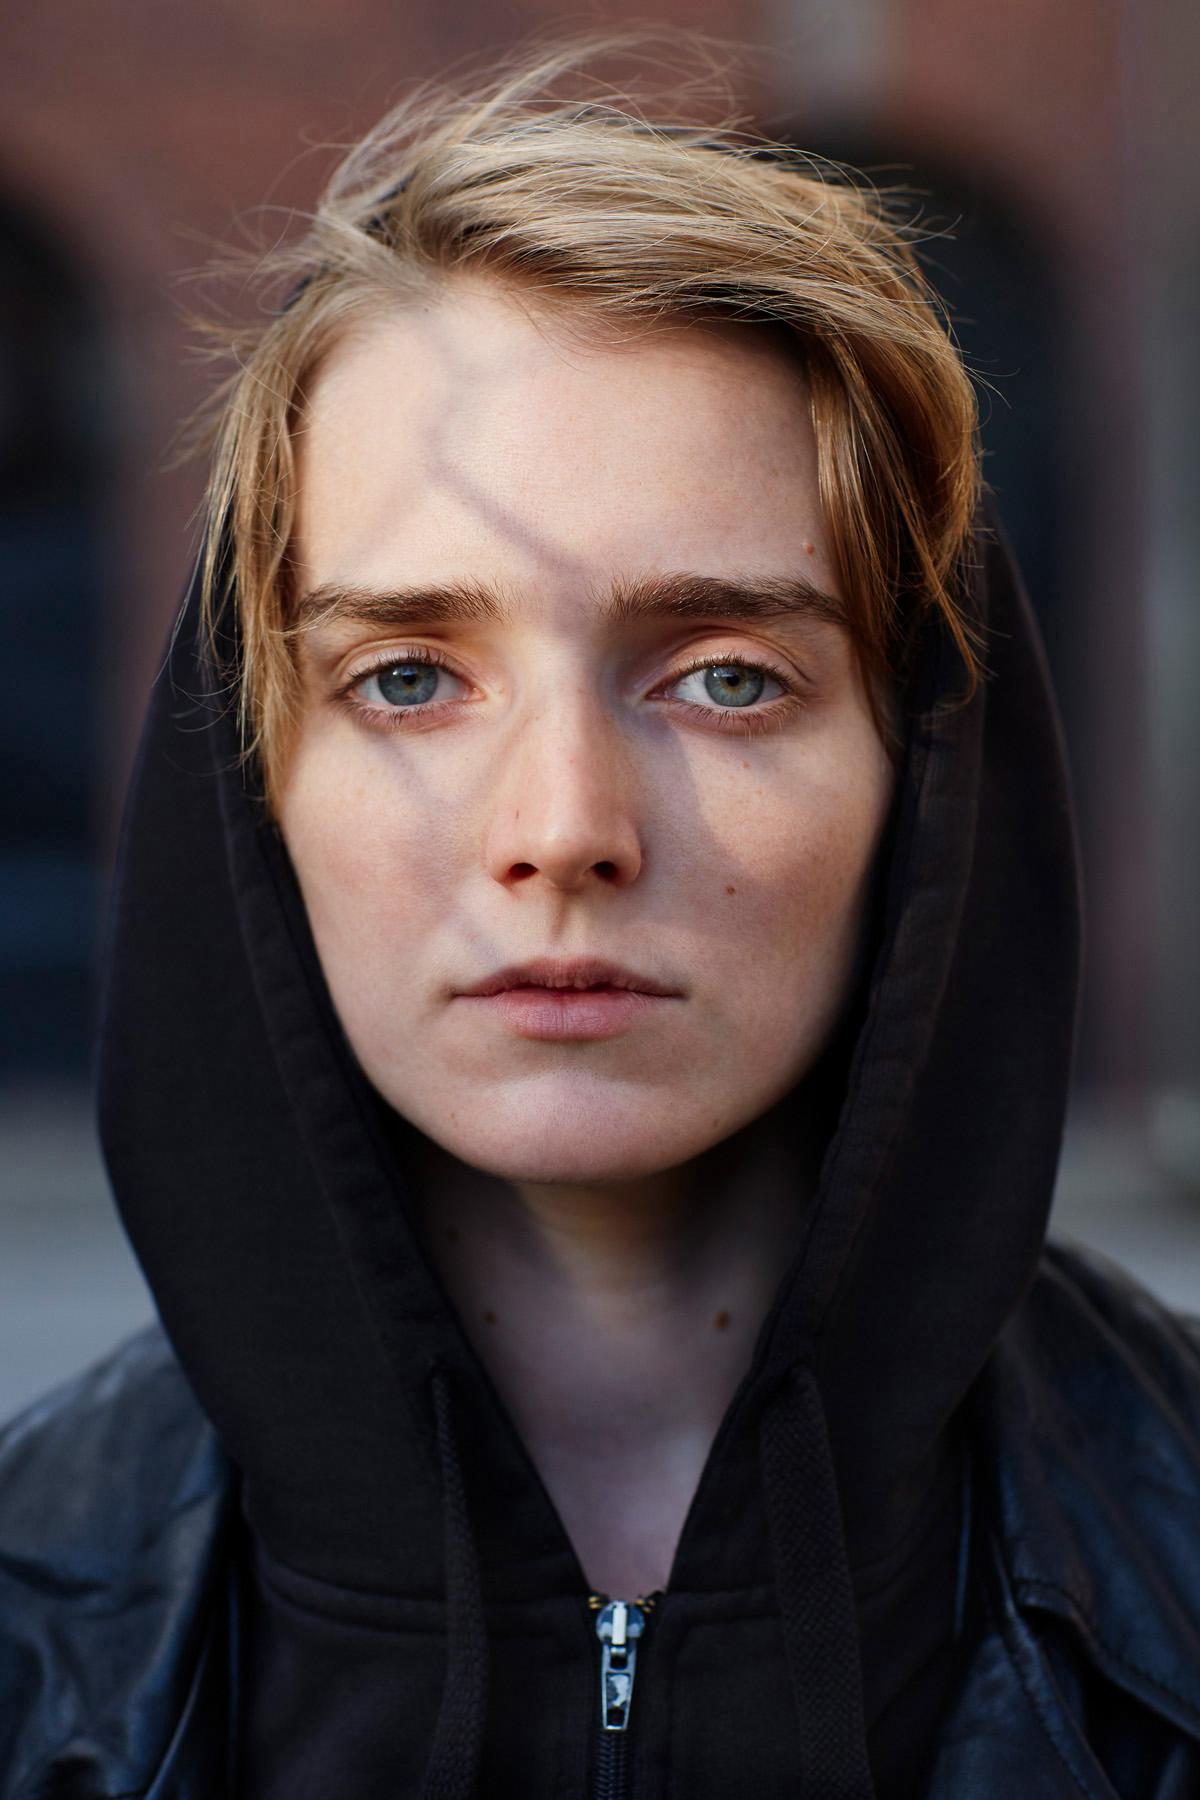 Lea Meienberg Katya Street Fashion NY 2018 Portrait